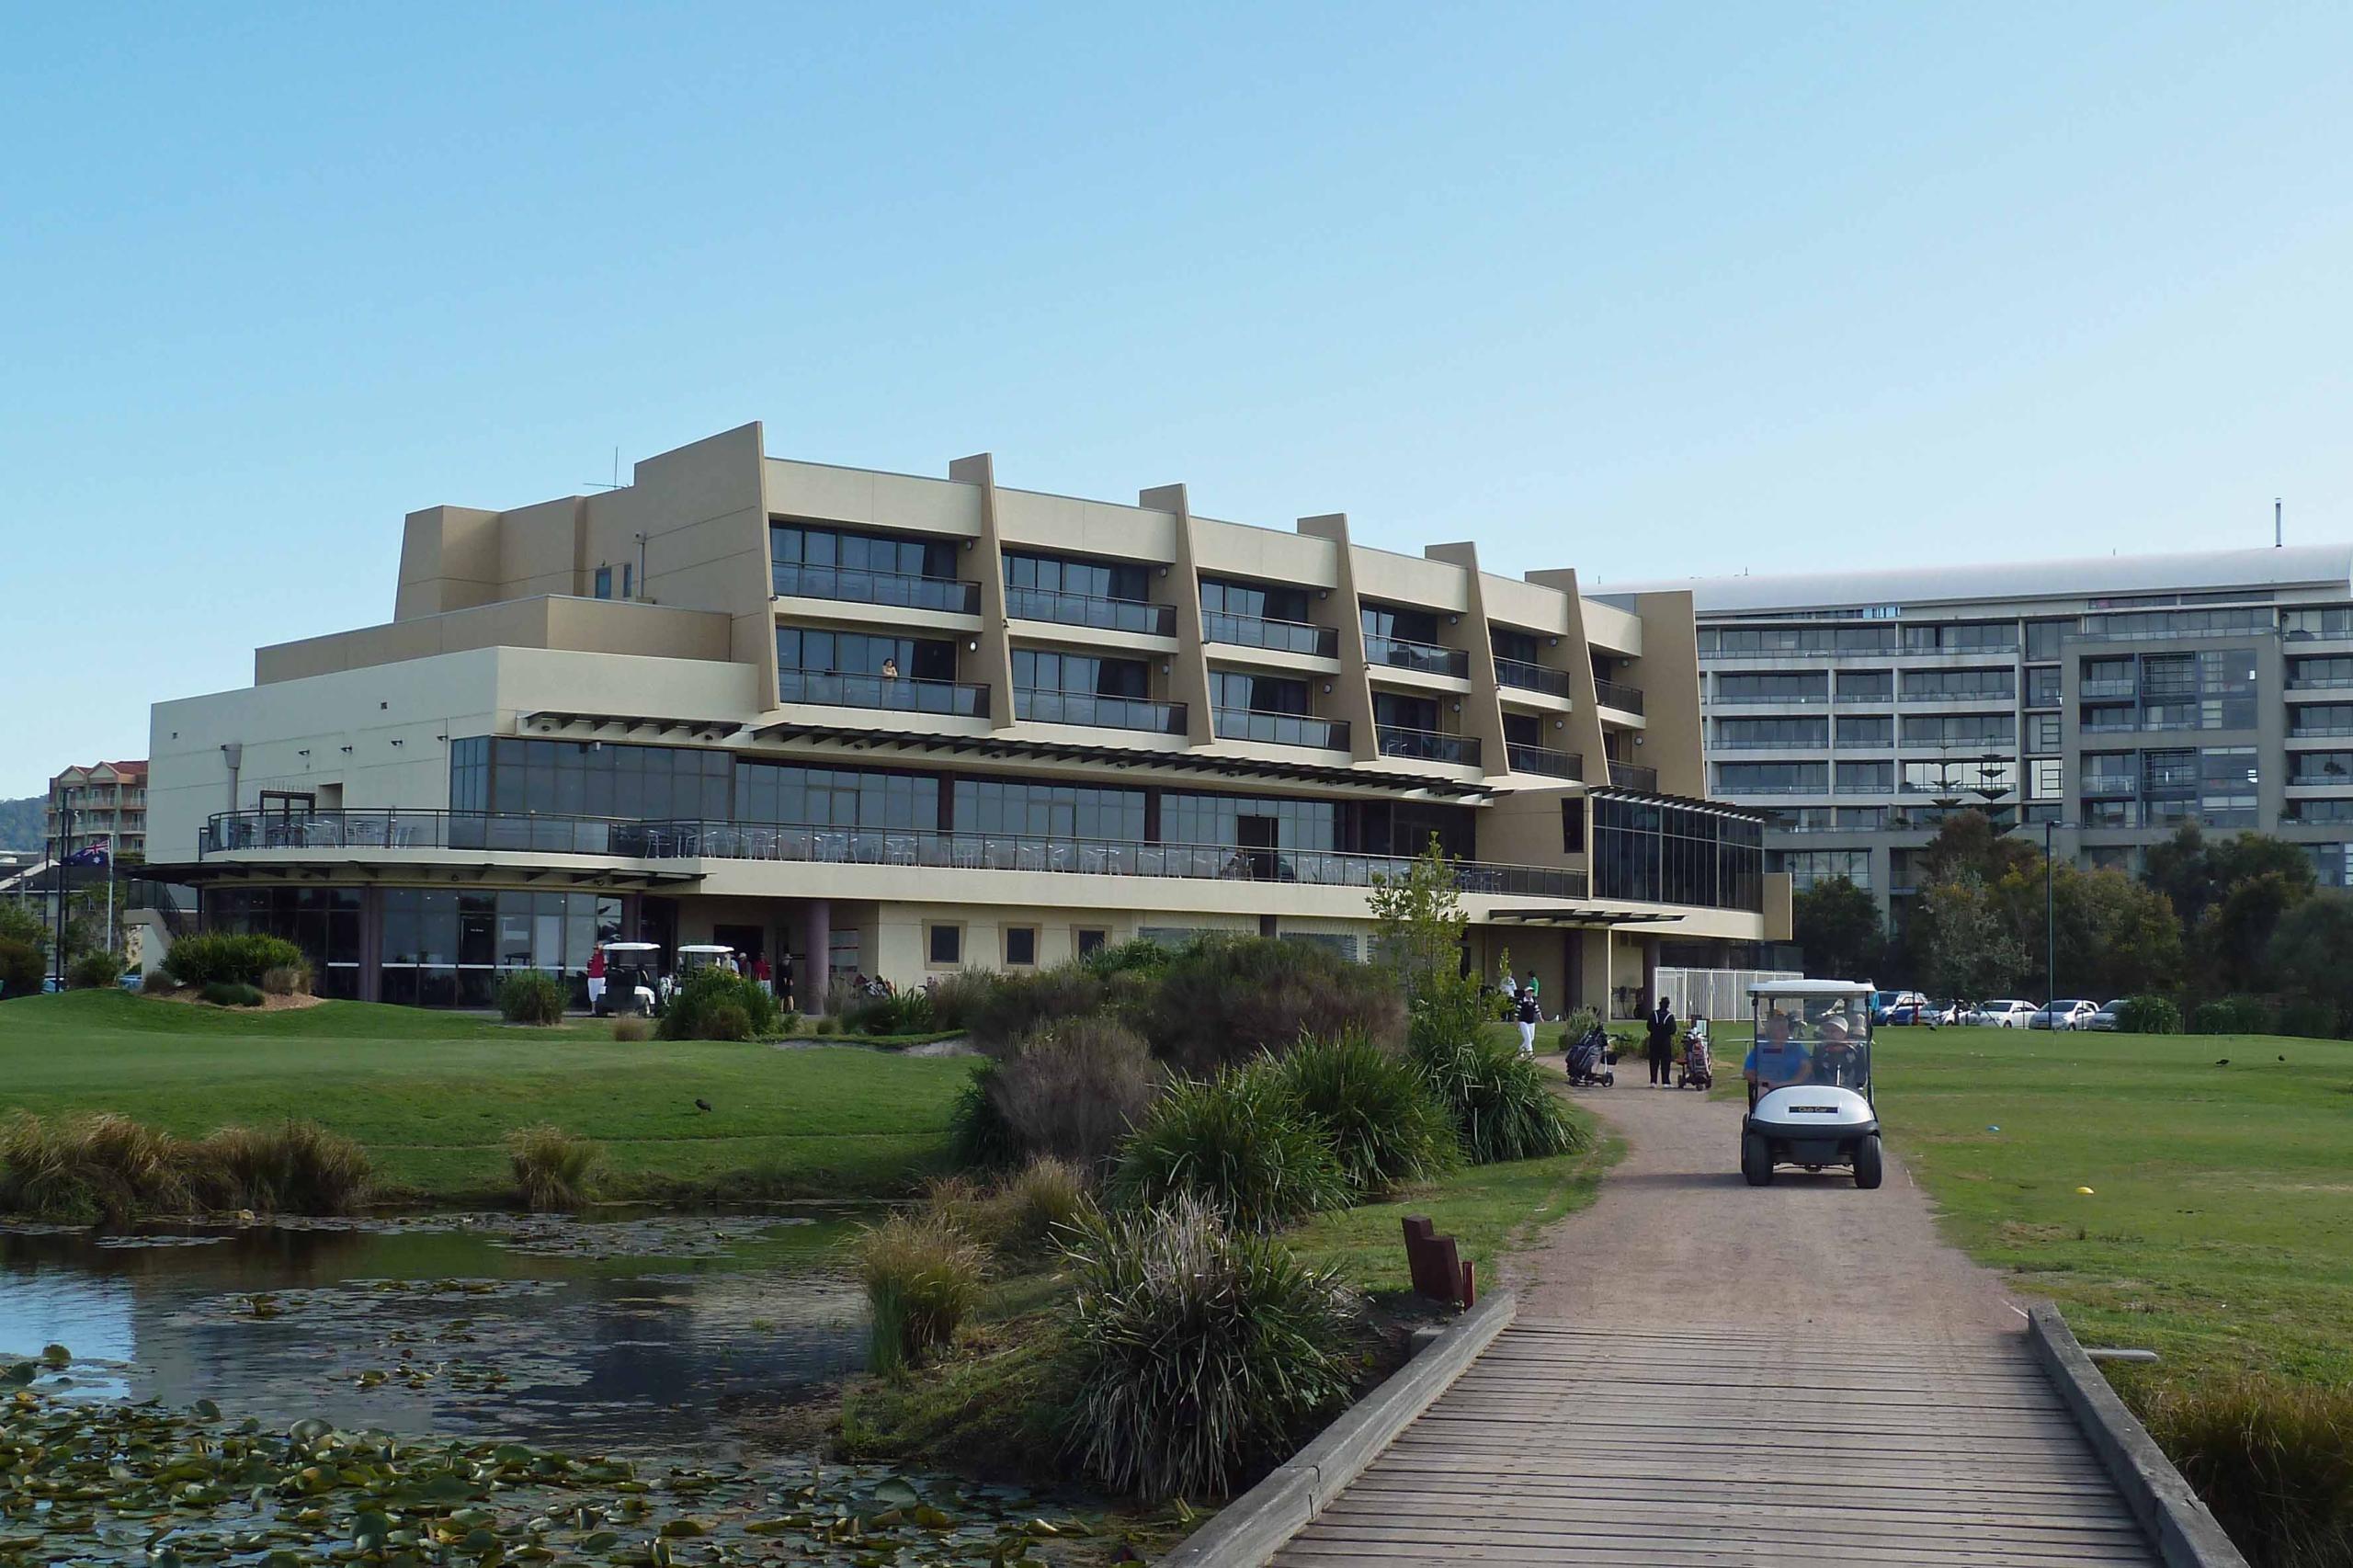 Wollongong Golf Course